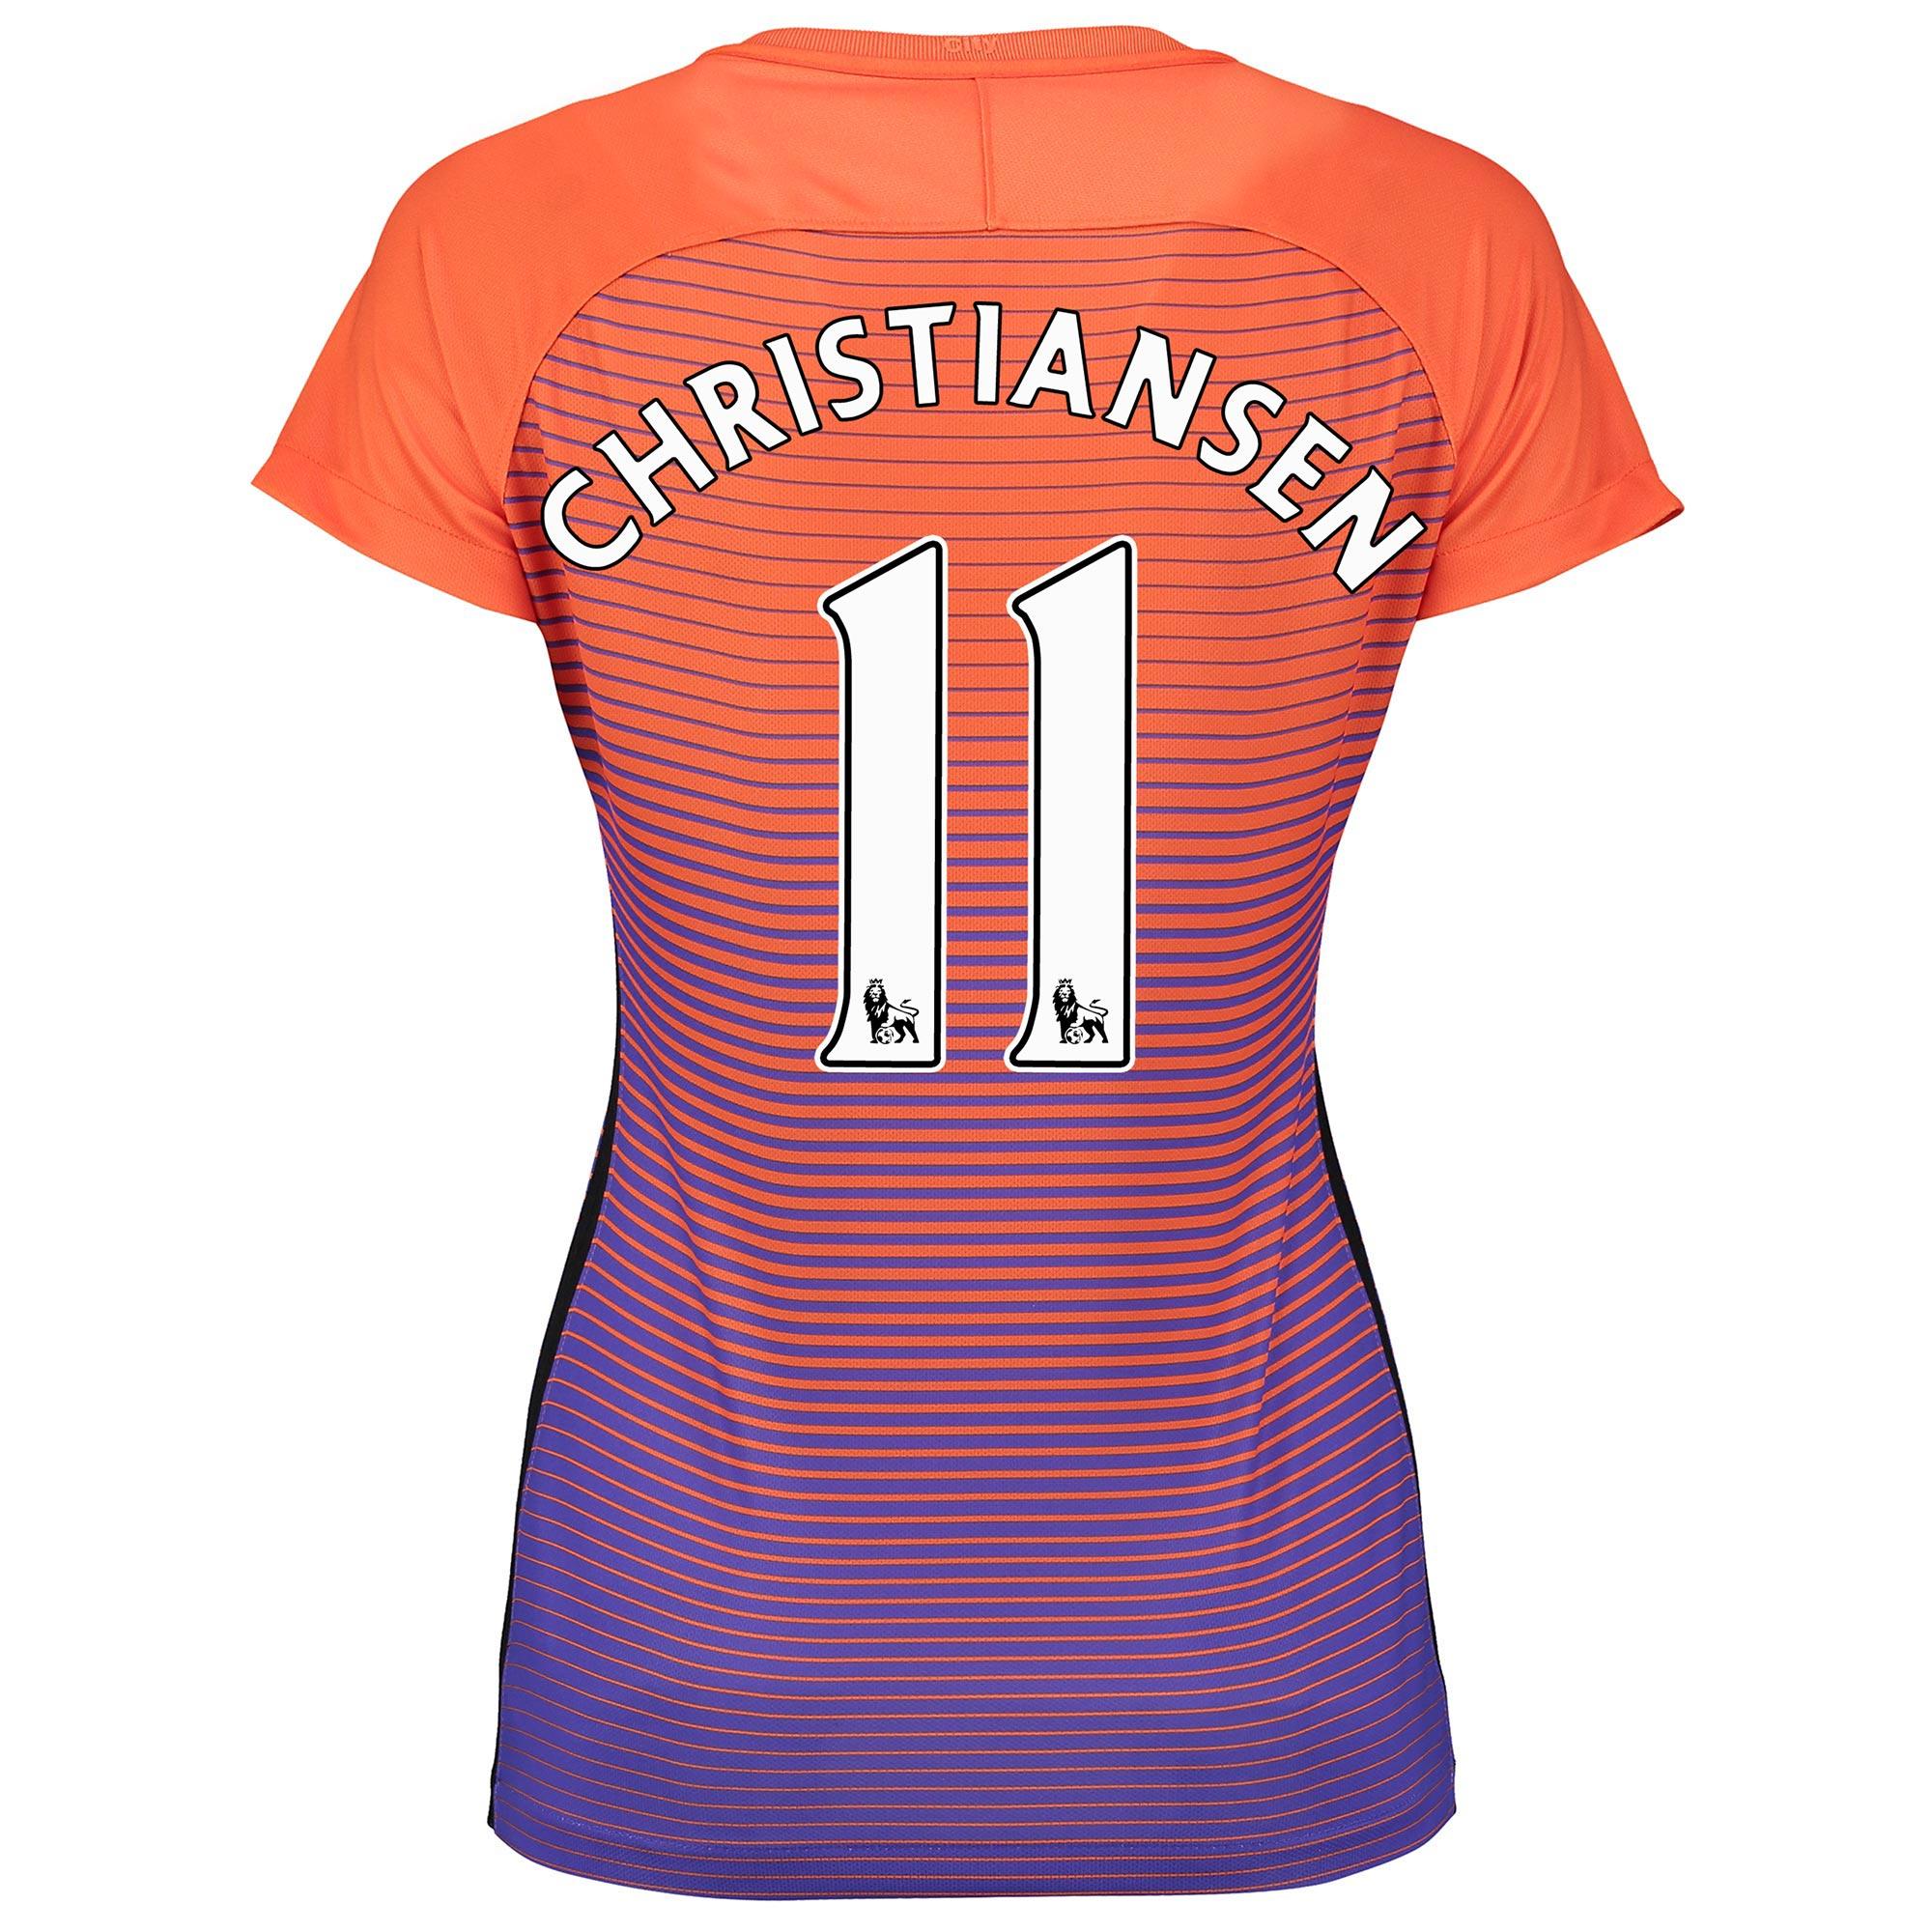 Manchester City Third Stadium Shirt 2016-17 - Womens with Christiansen